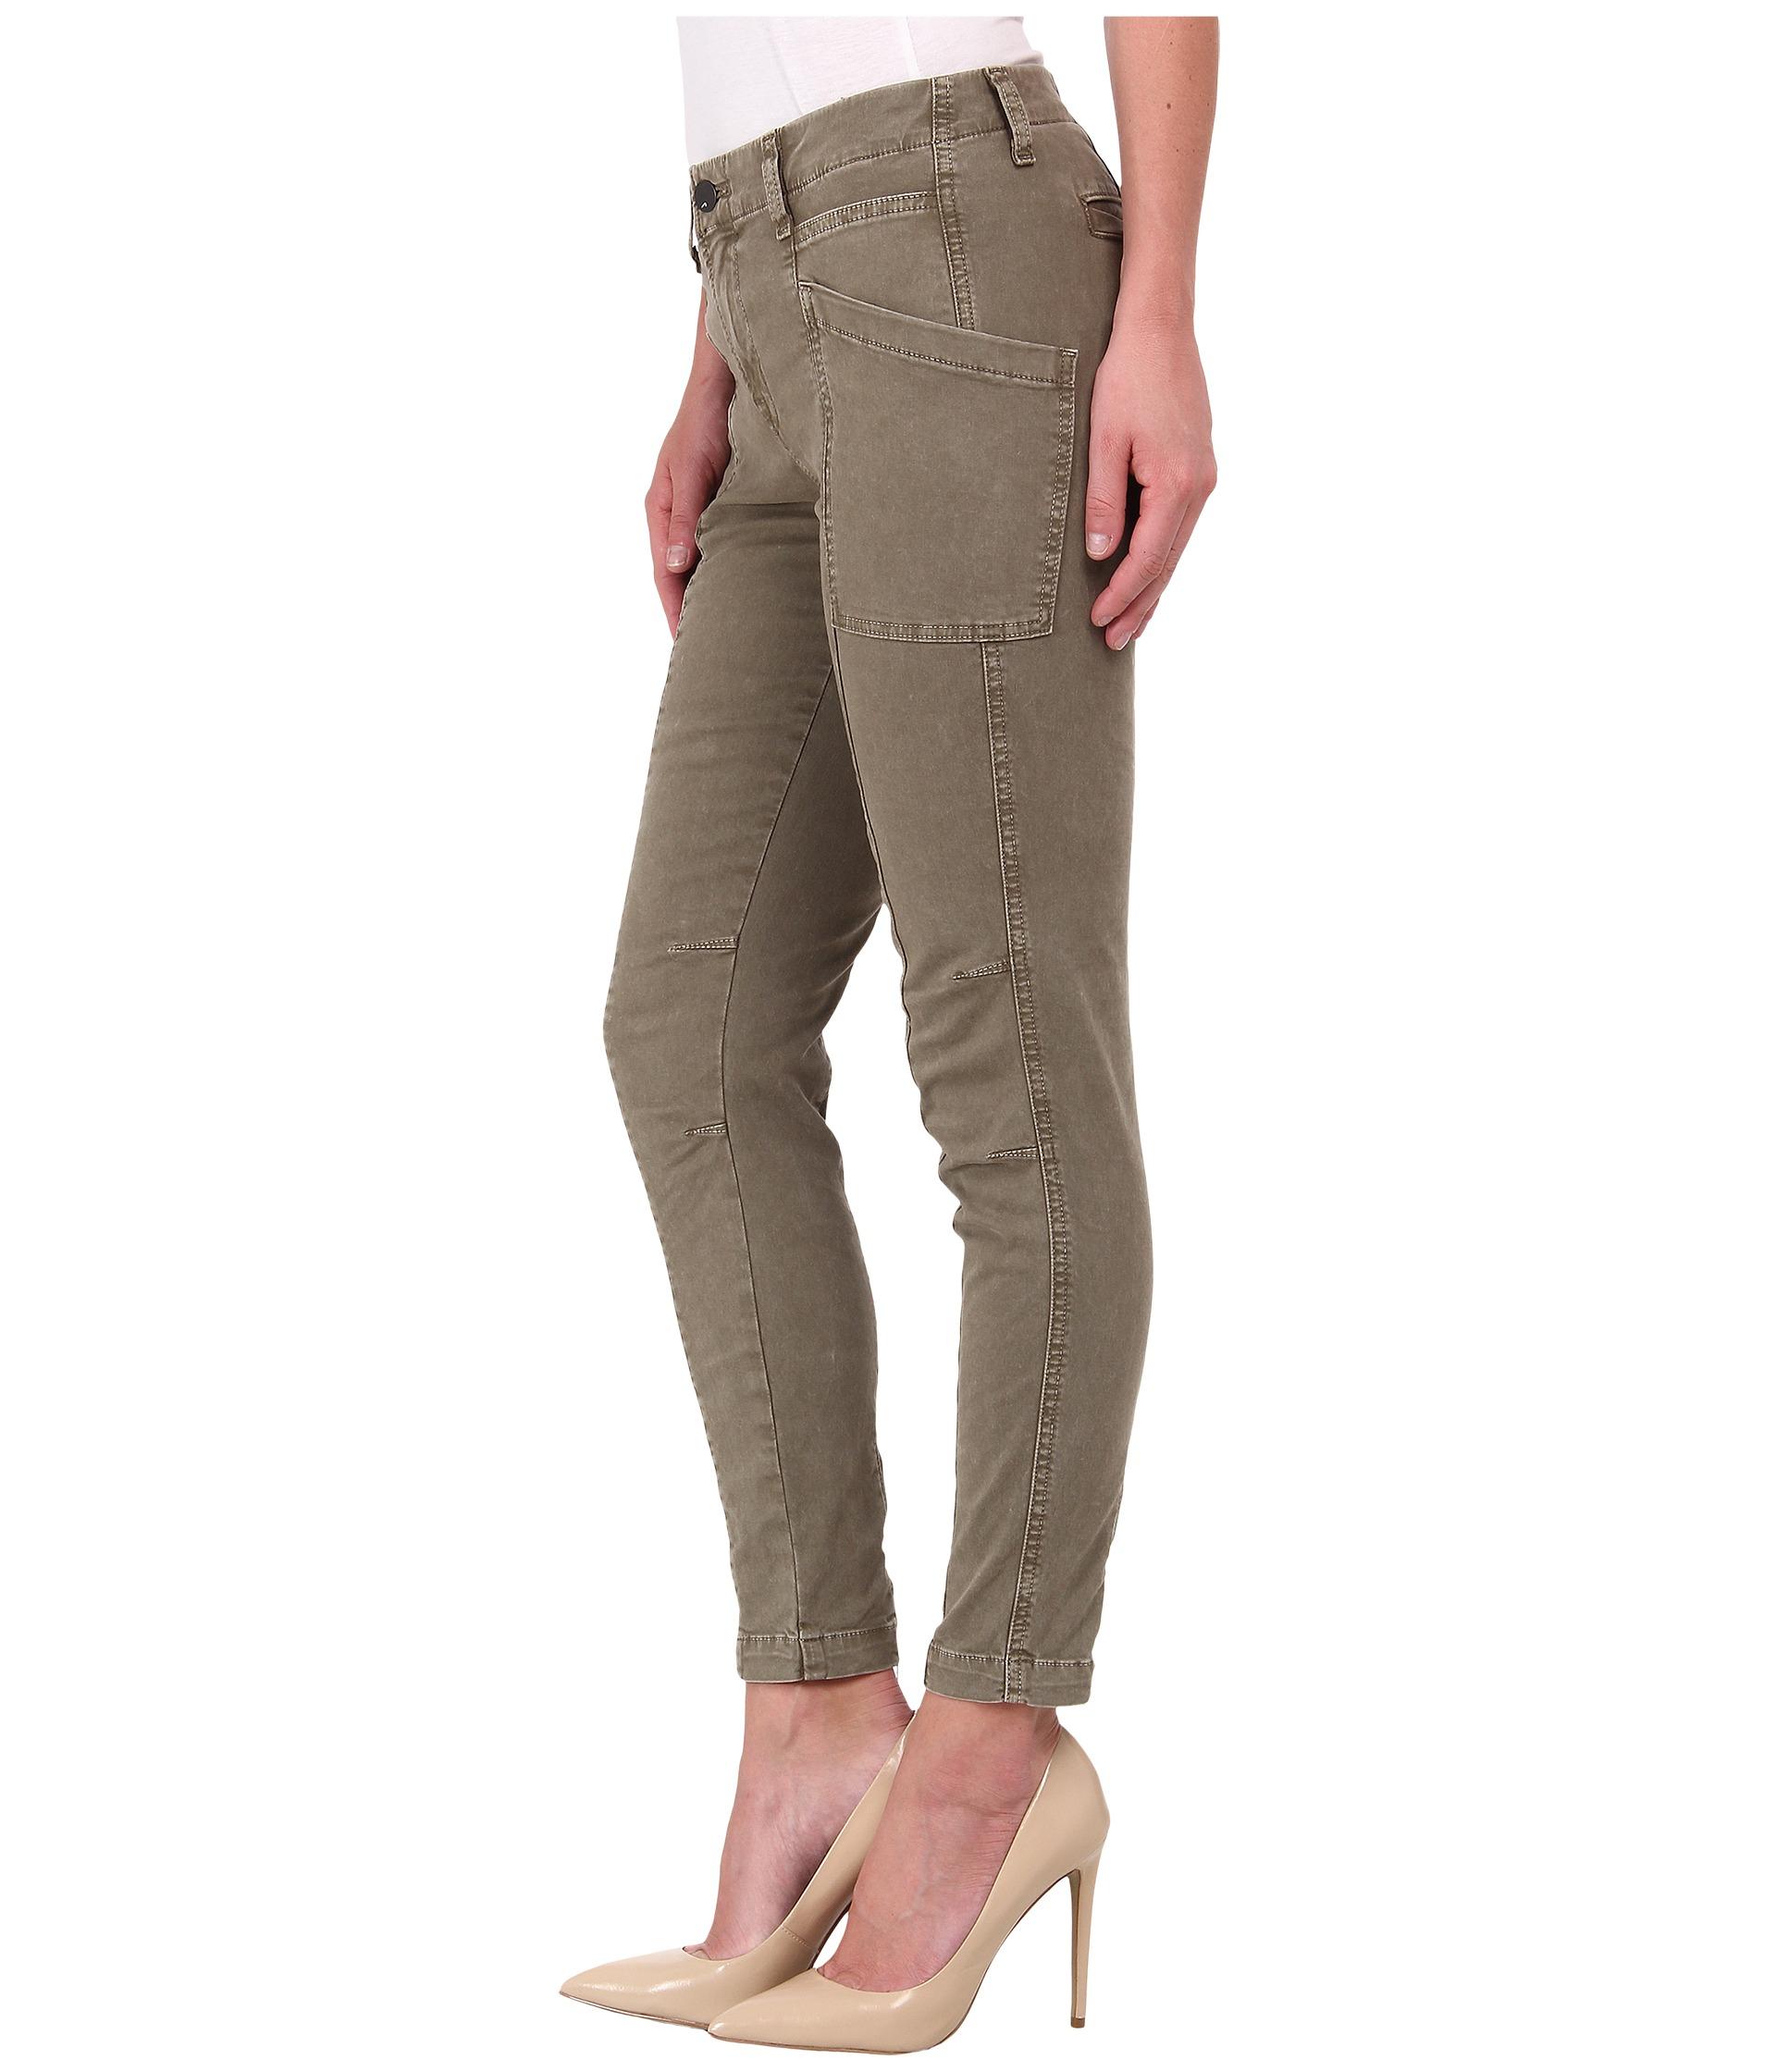 Innovative Skinny Khaki Cargo Pants For Women  White Pants 2016